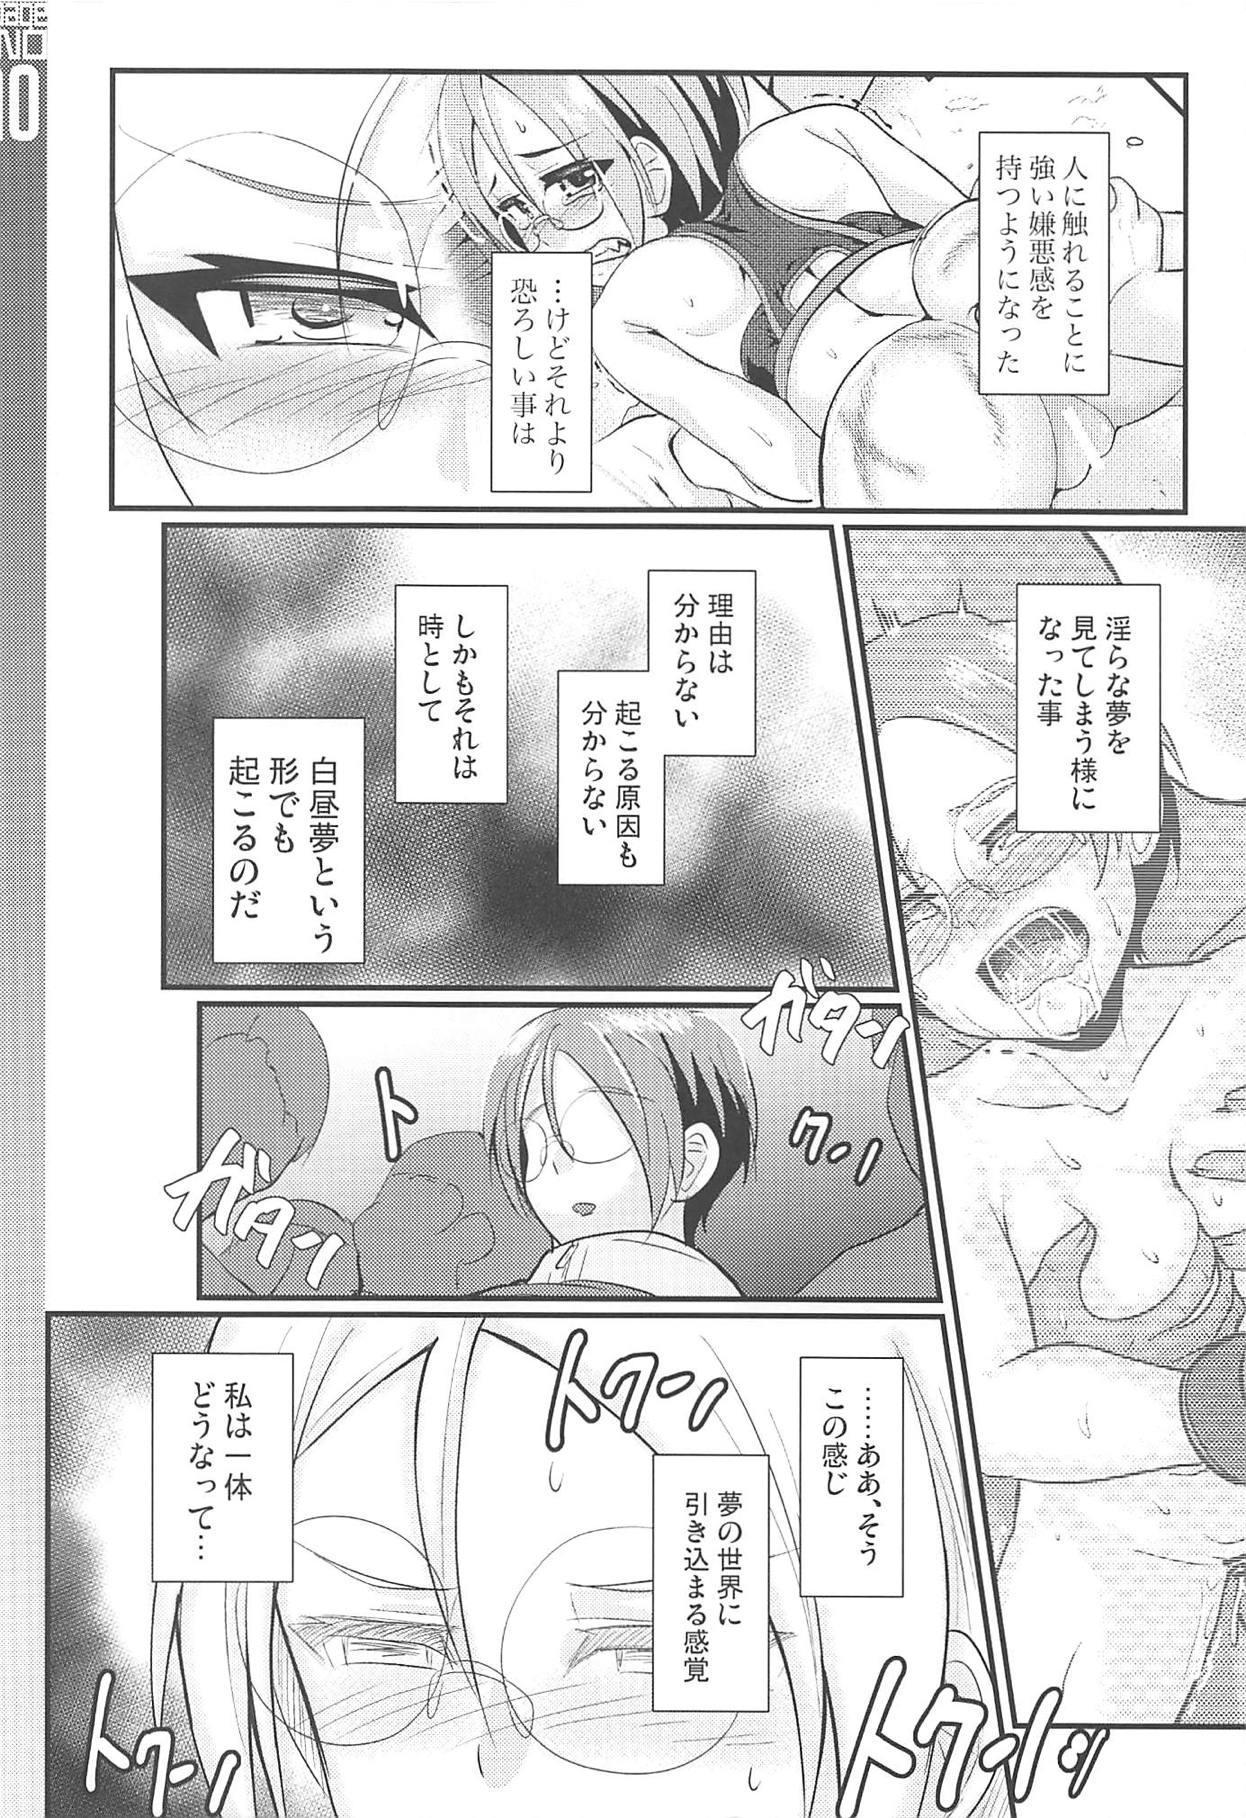 (Panzer Vor! 15) [Trample Rigger (Yequo)] Zoku [Ru-gata] Avenger Shoushitsu Jiken (Girls und Panzer) 8